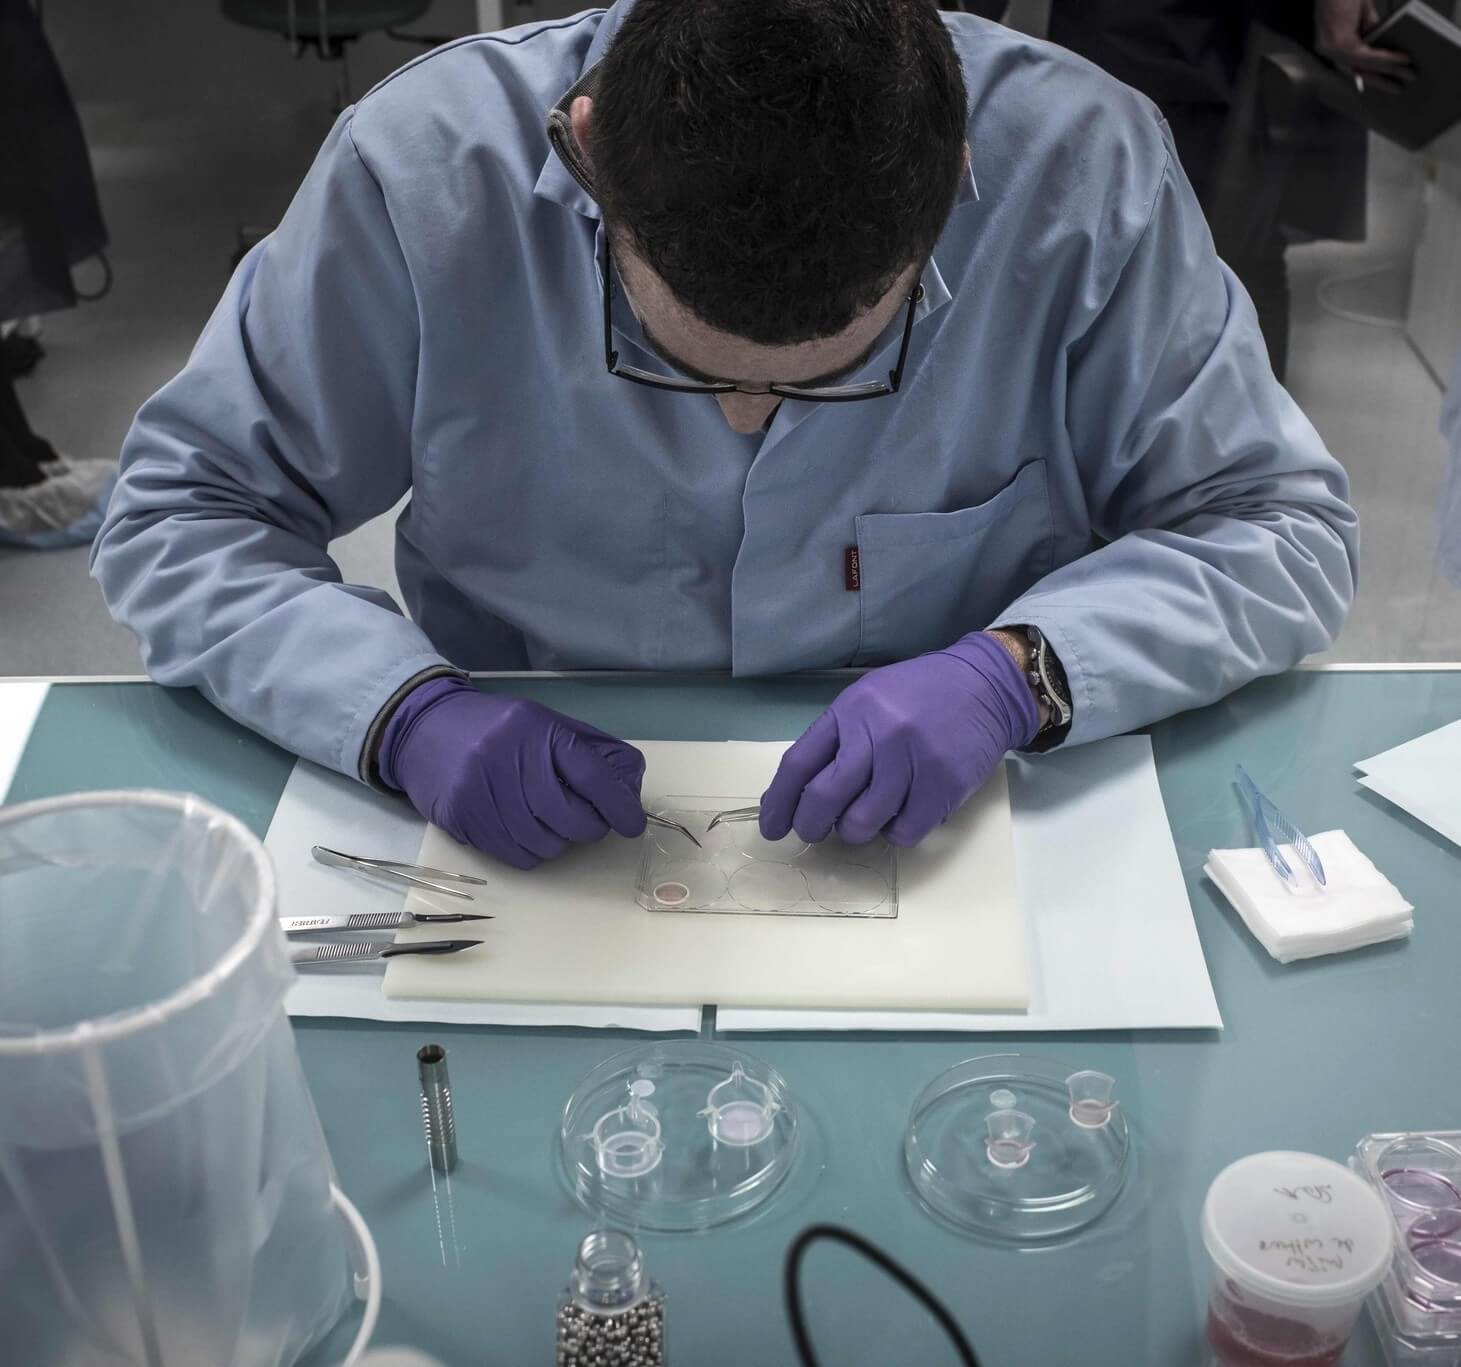 la oe firestein science replication failure